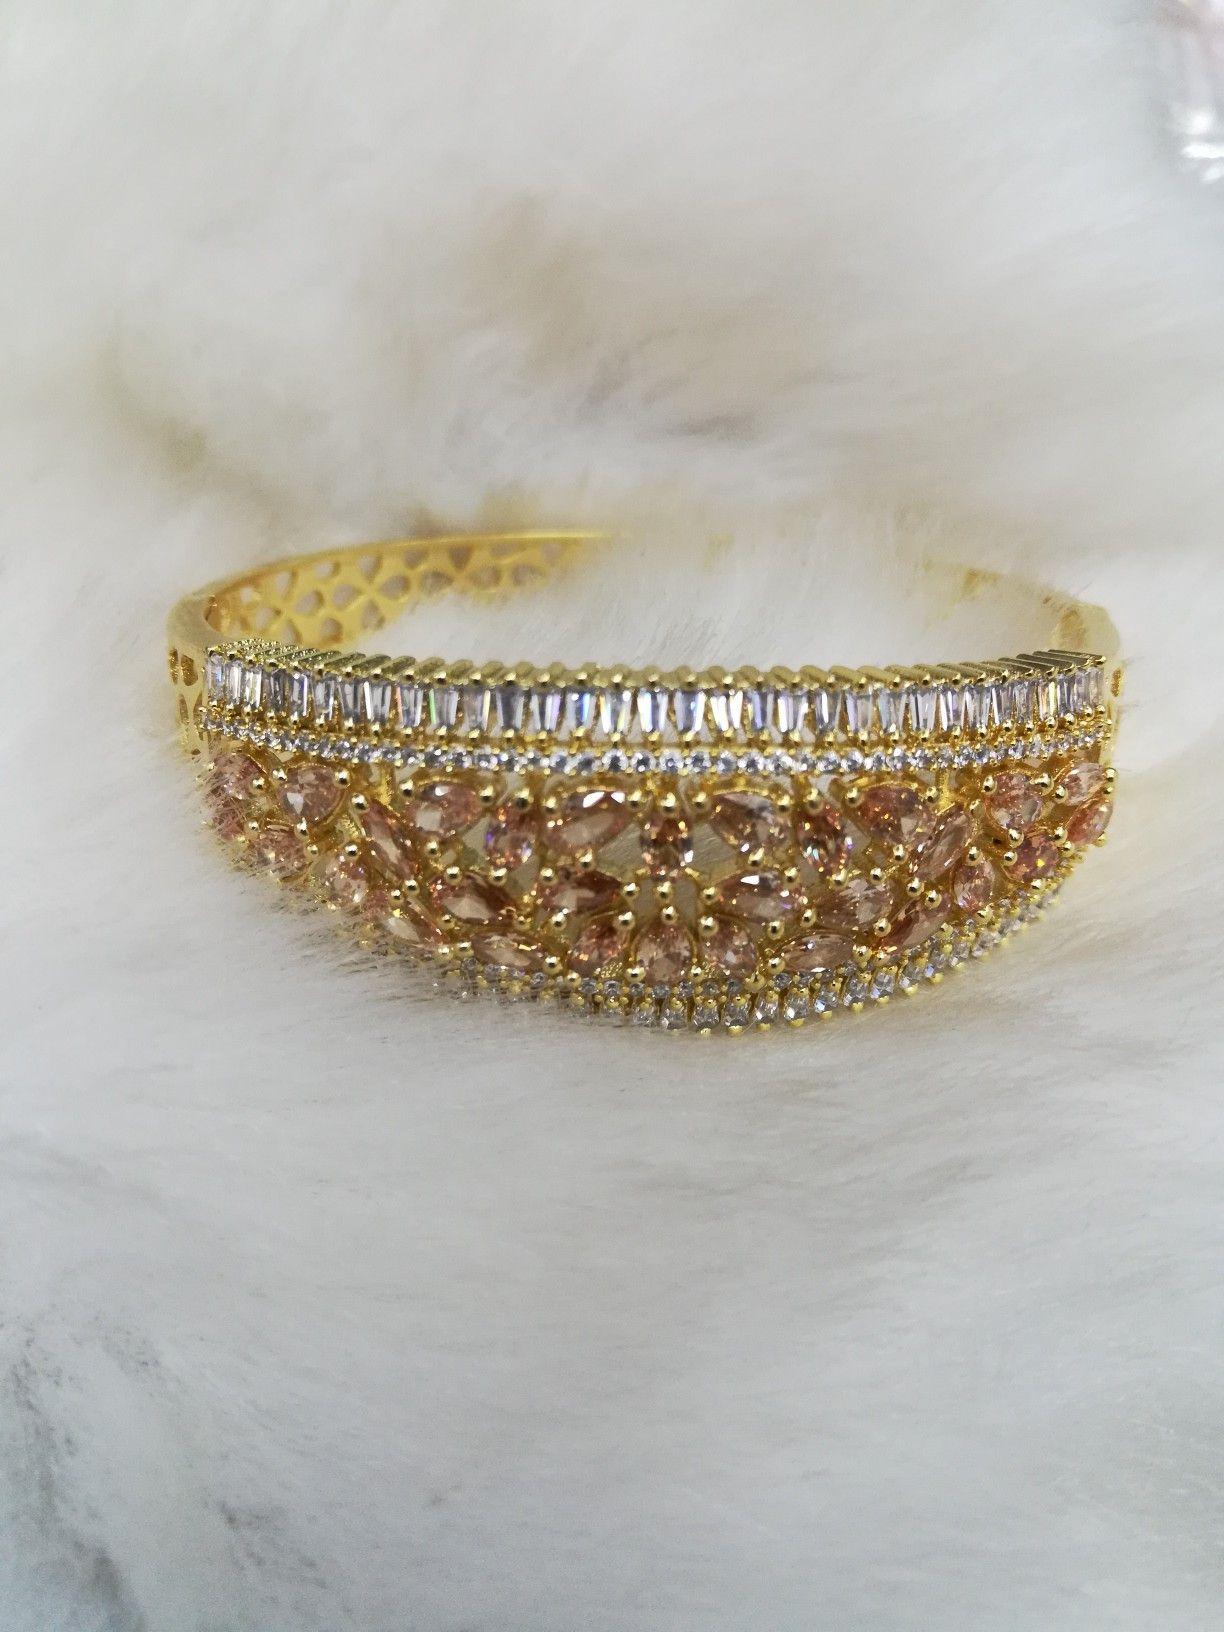 Champagne Bracelet Designs Jewelry Jewellery Necklace Earrings Fashionjewelry Women Womensfashion Abdesigns Abdesignindia